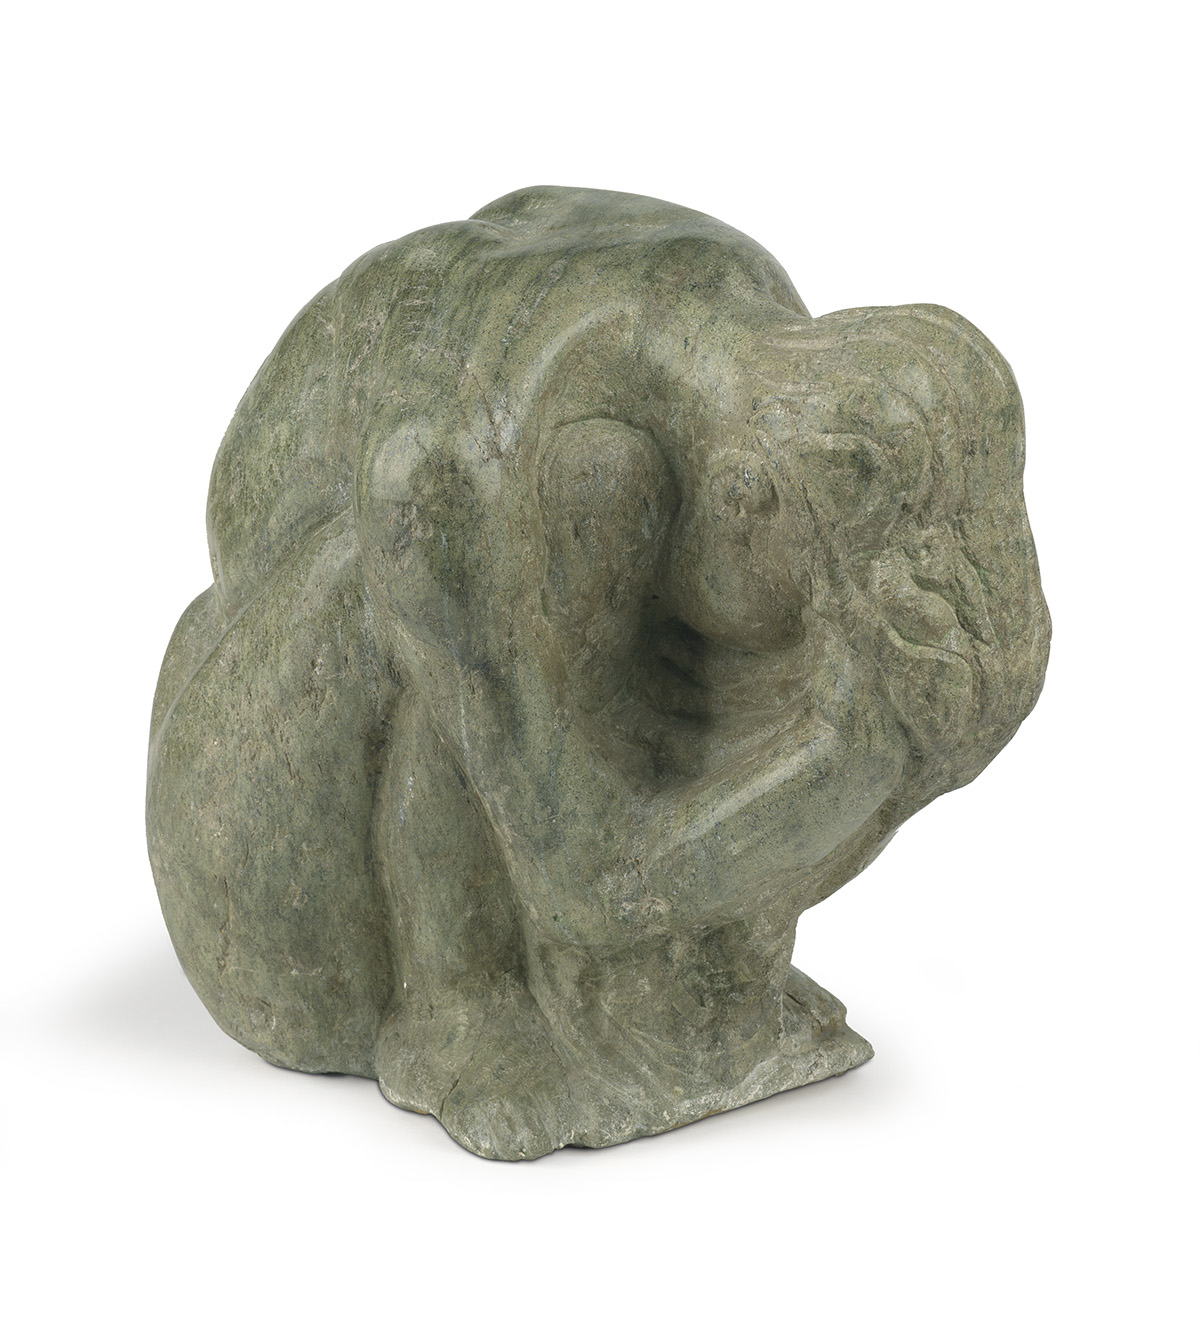 SELMA BURKE (1900 - 1995) Sadness.